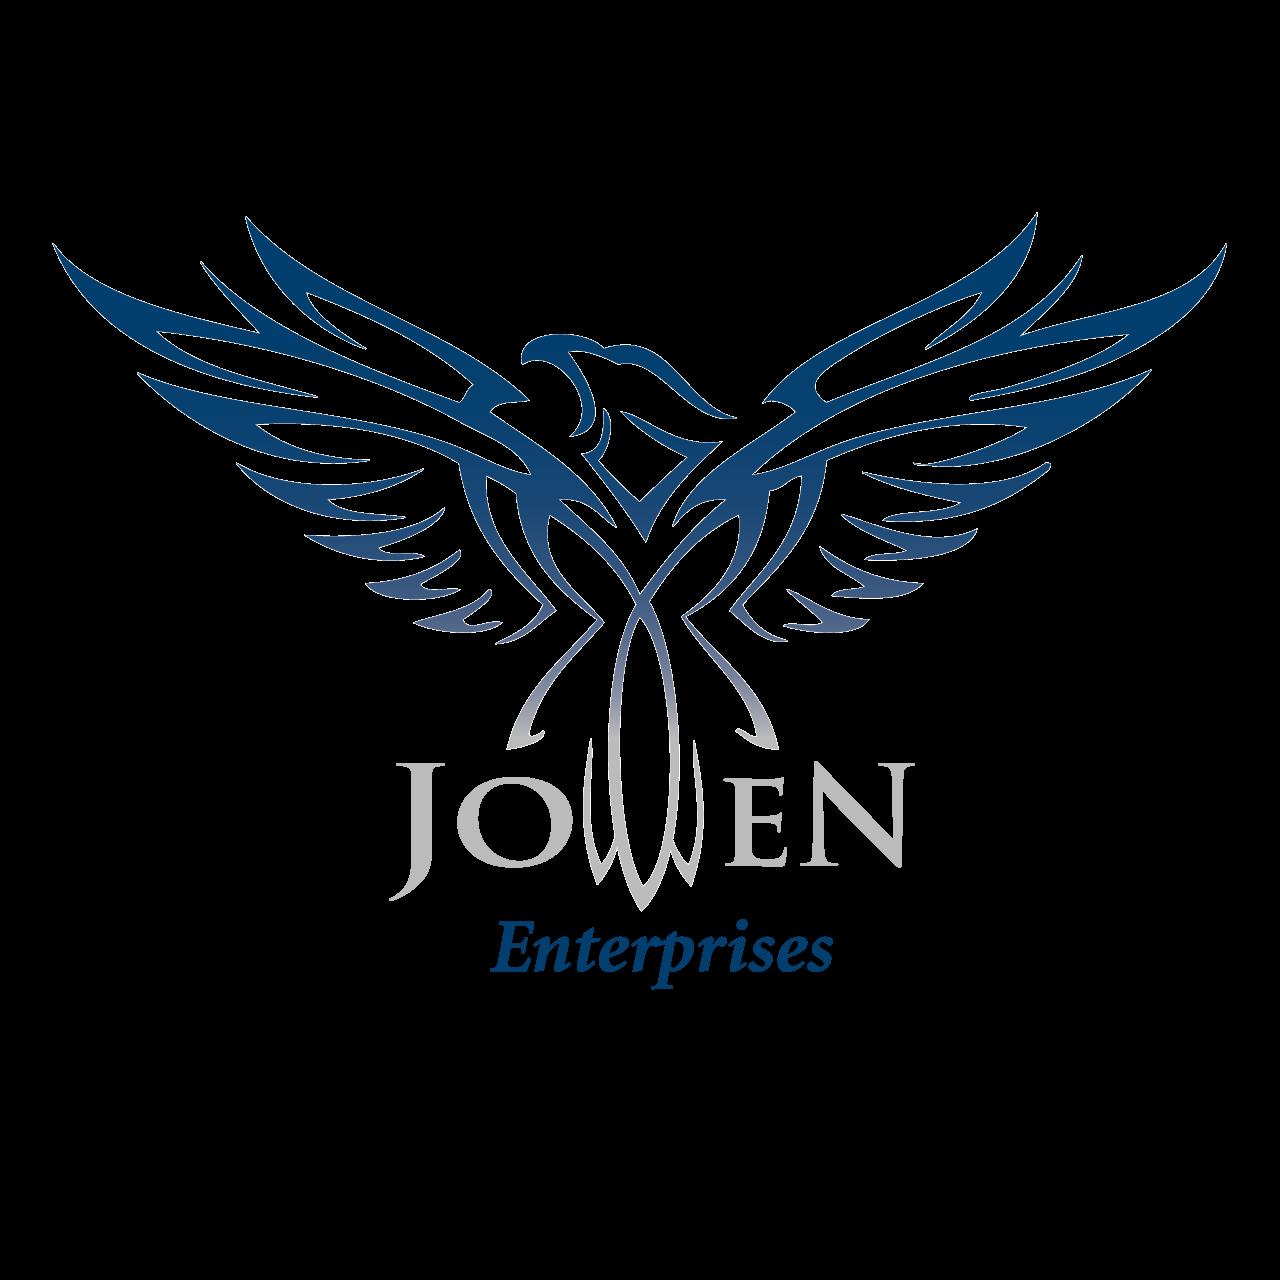 Eagle | Logo Design by simc | Dribbble | Dribbble